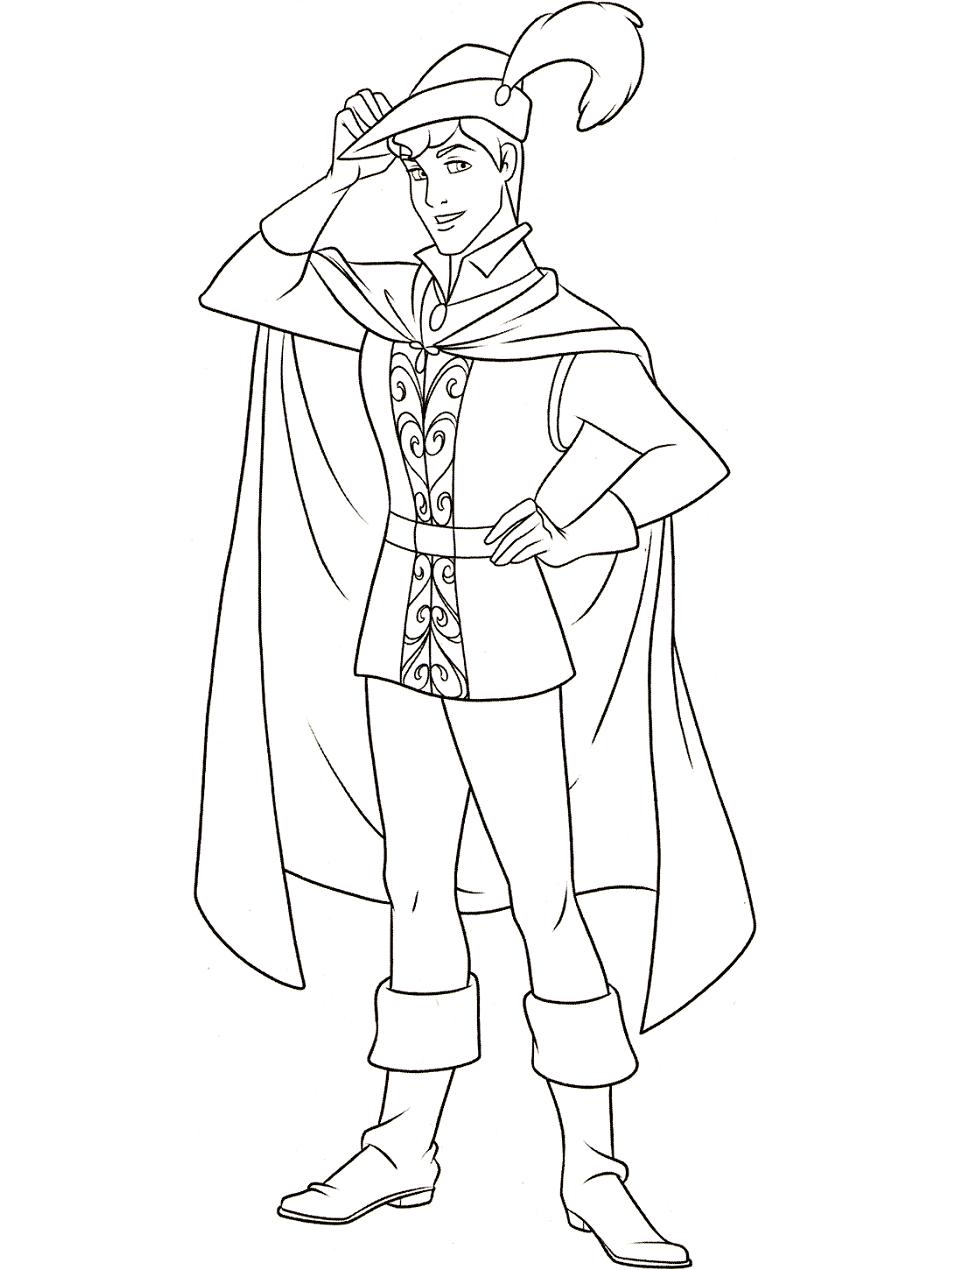 Handsome Prince Phillip